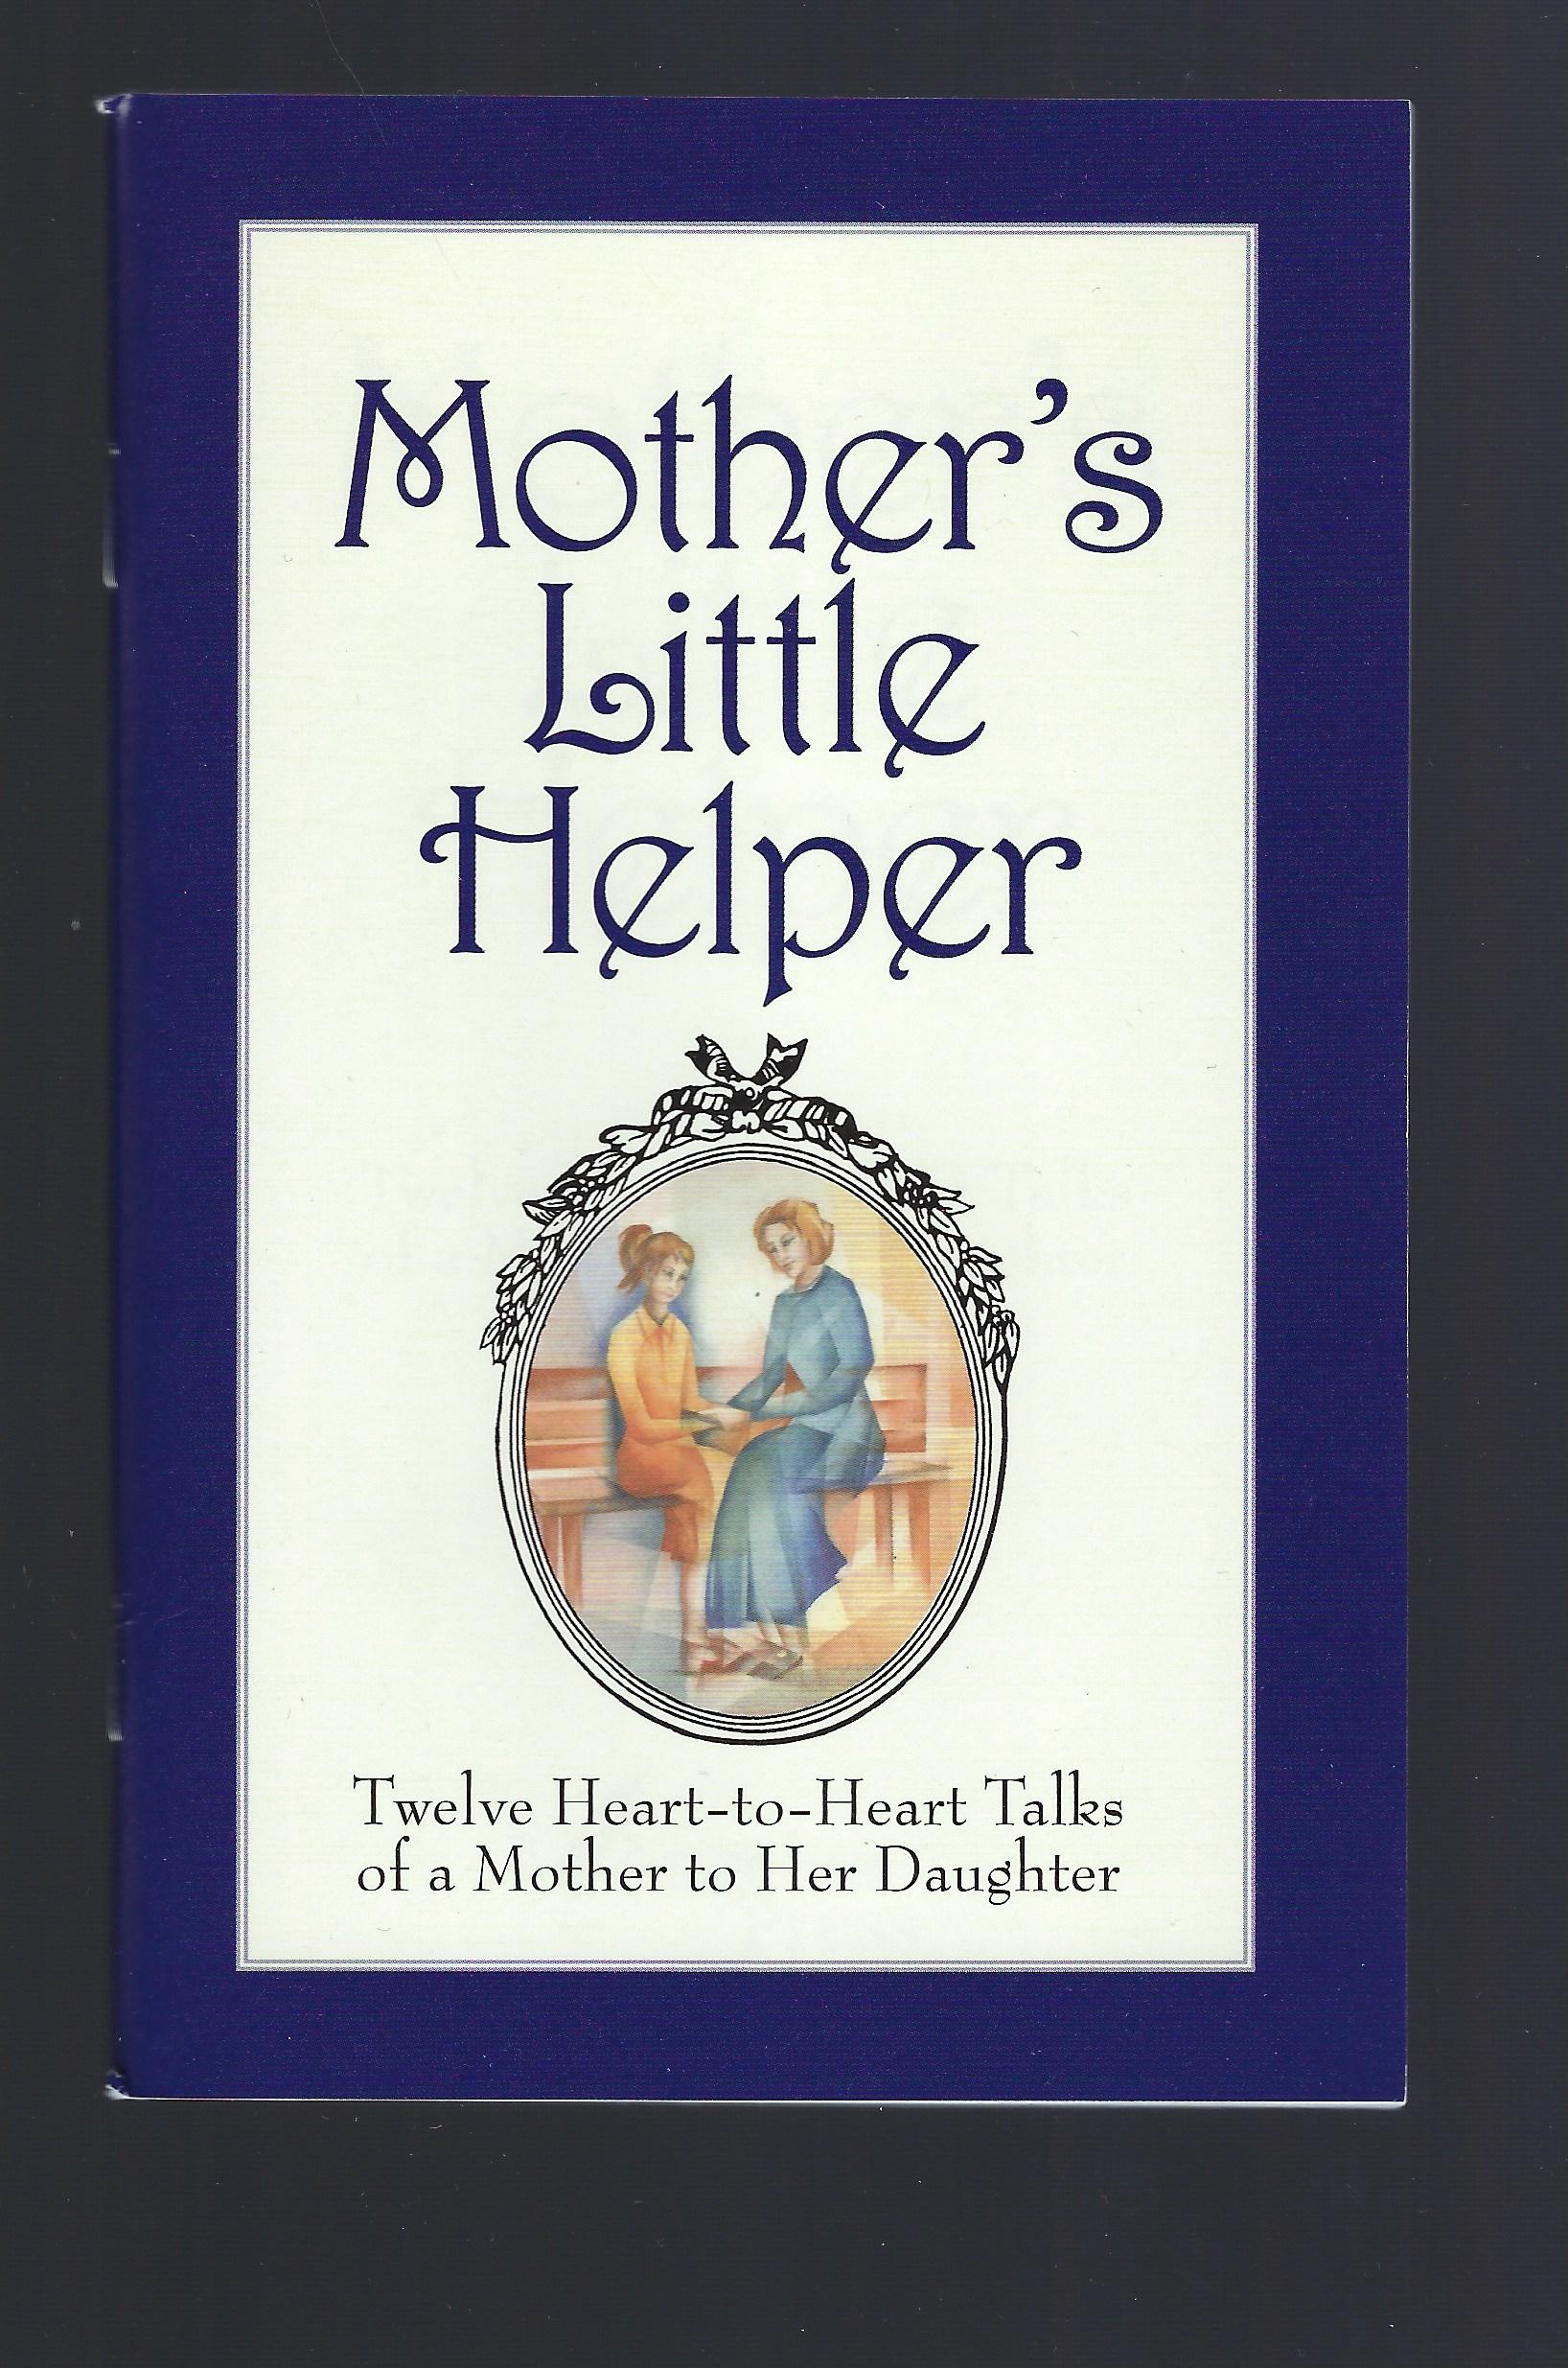 Mother's Little Helper (Twelve Heart-to-Heart Talks of a Mother to Her Daughter)